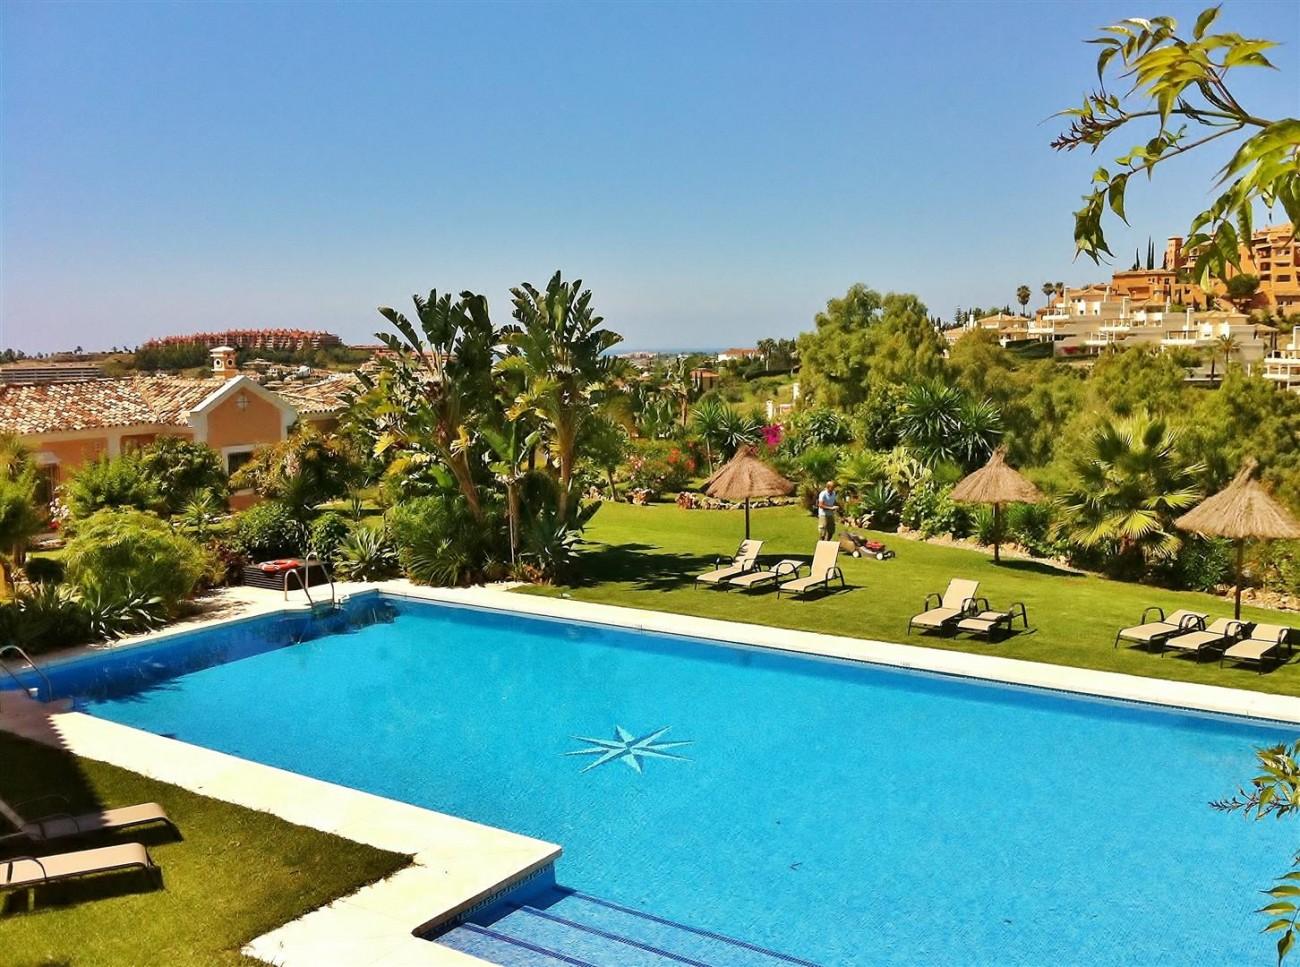 V5019 Villa in Nueva Andalucia Marbella Spain (1)